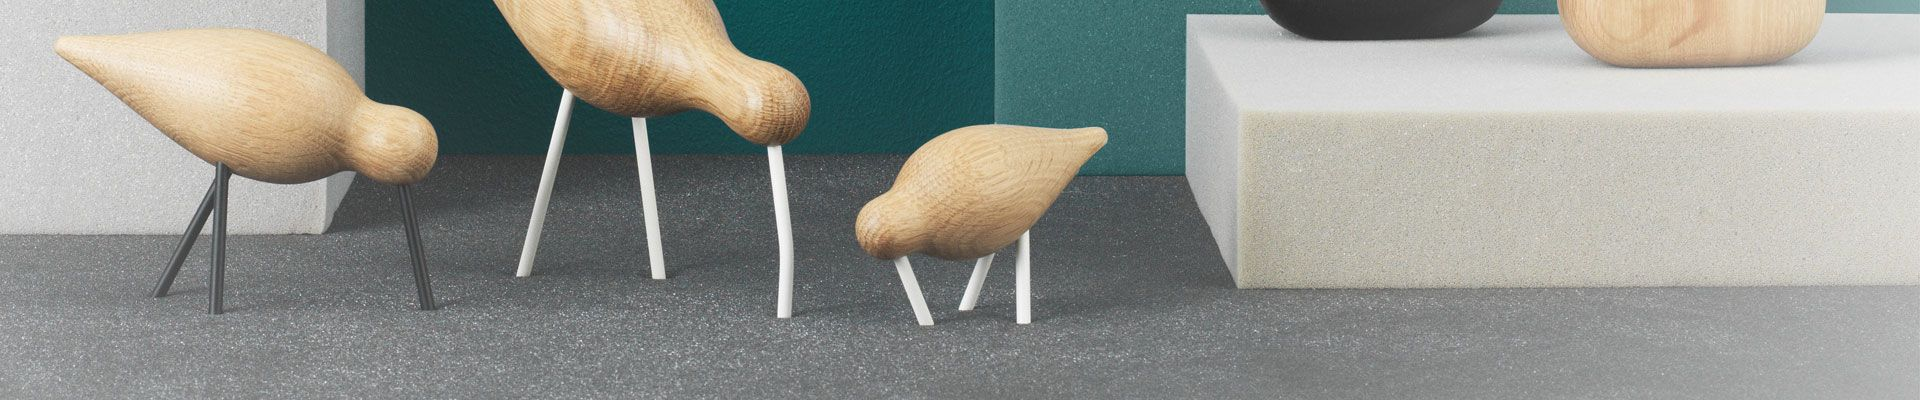 Normann Copenhagen collectors items